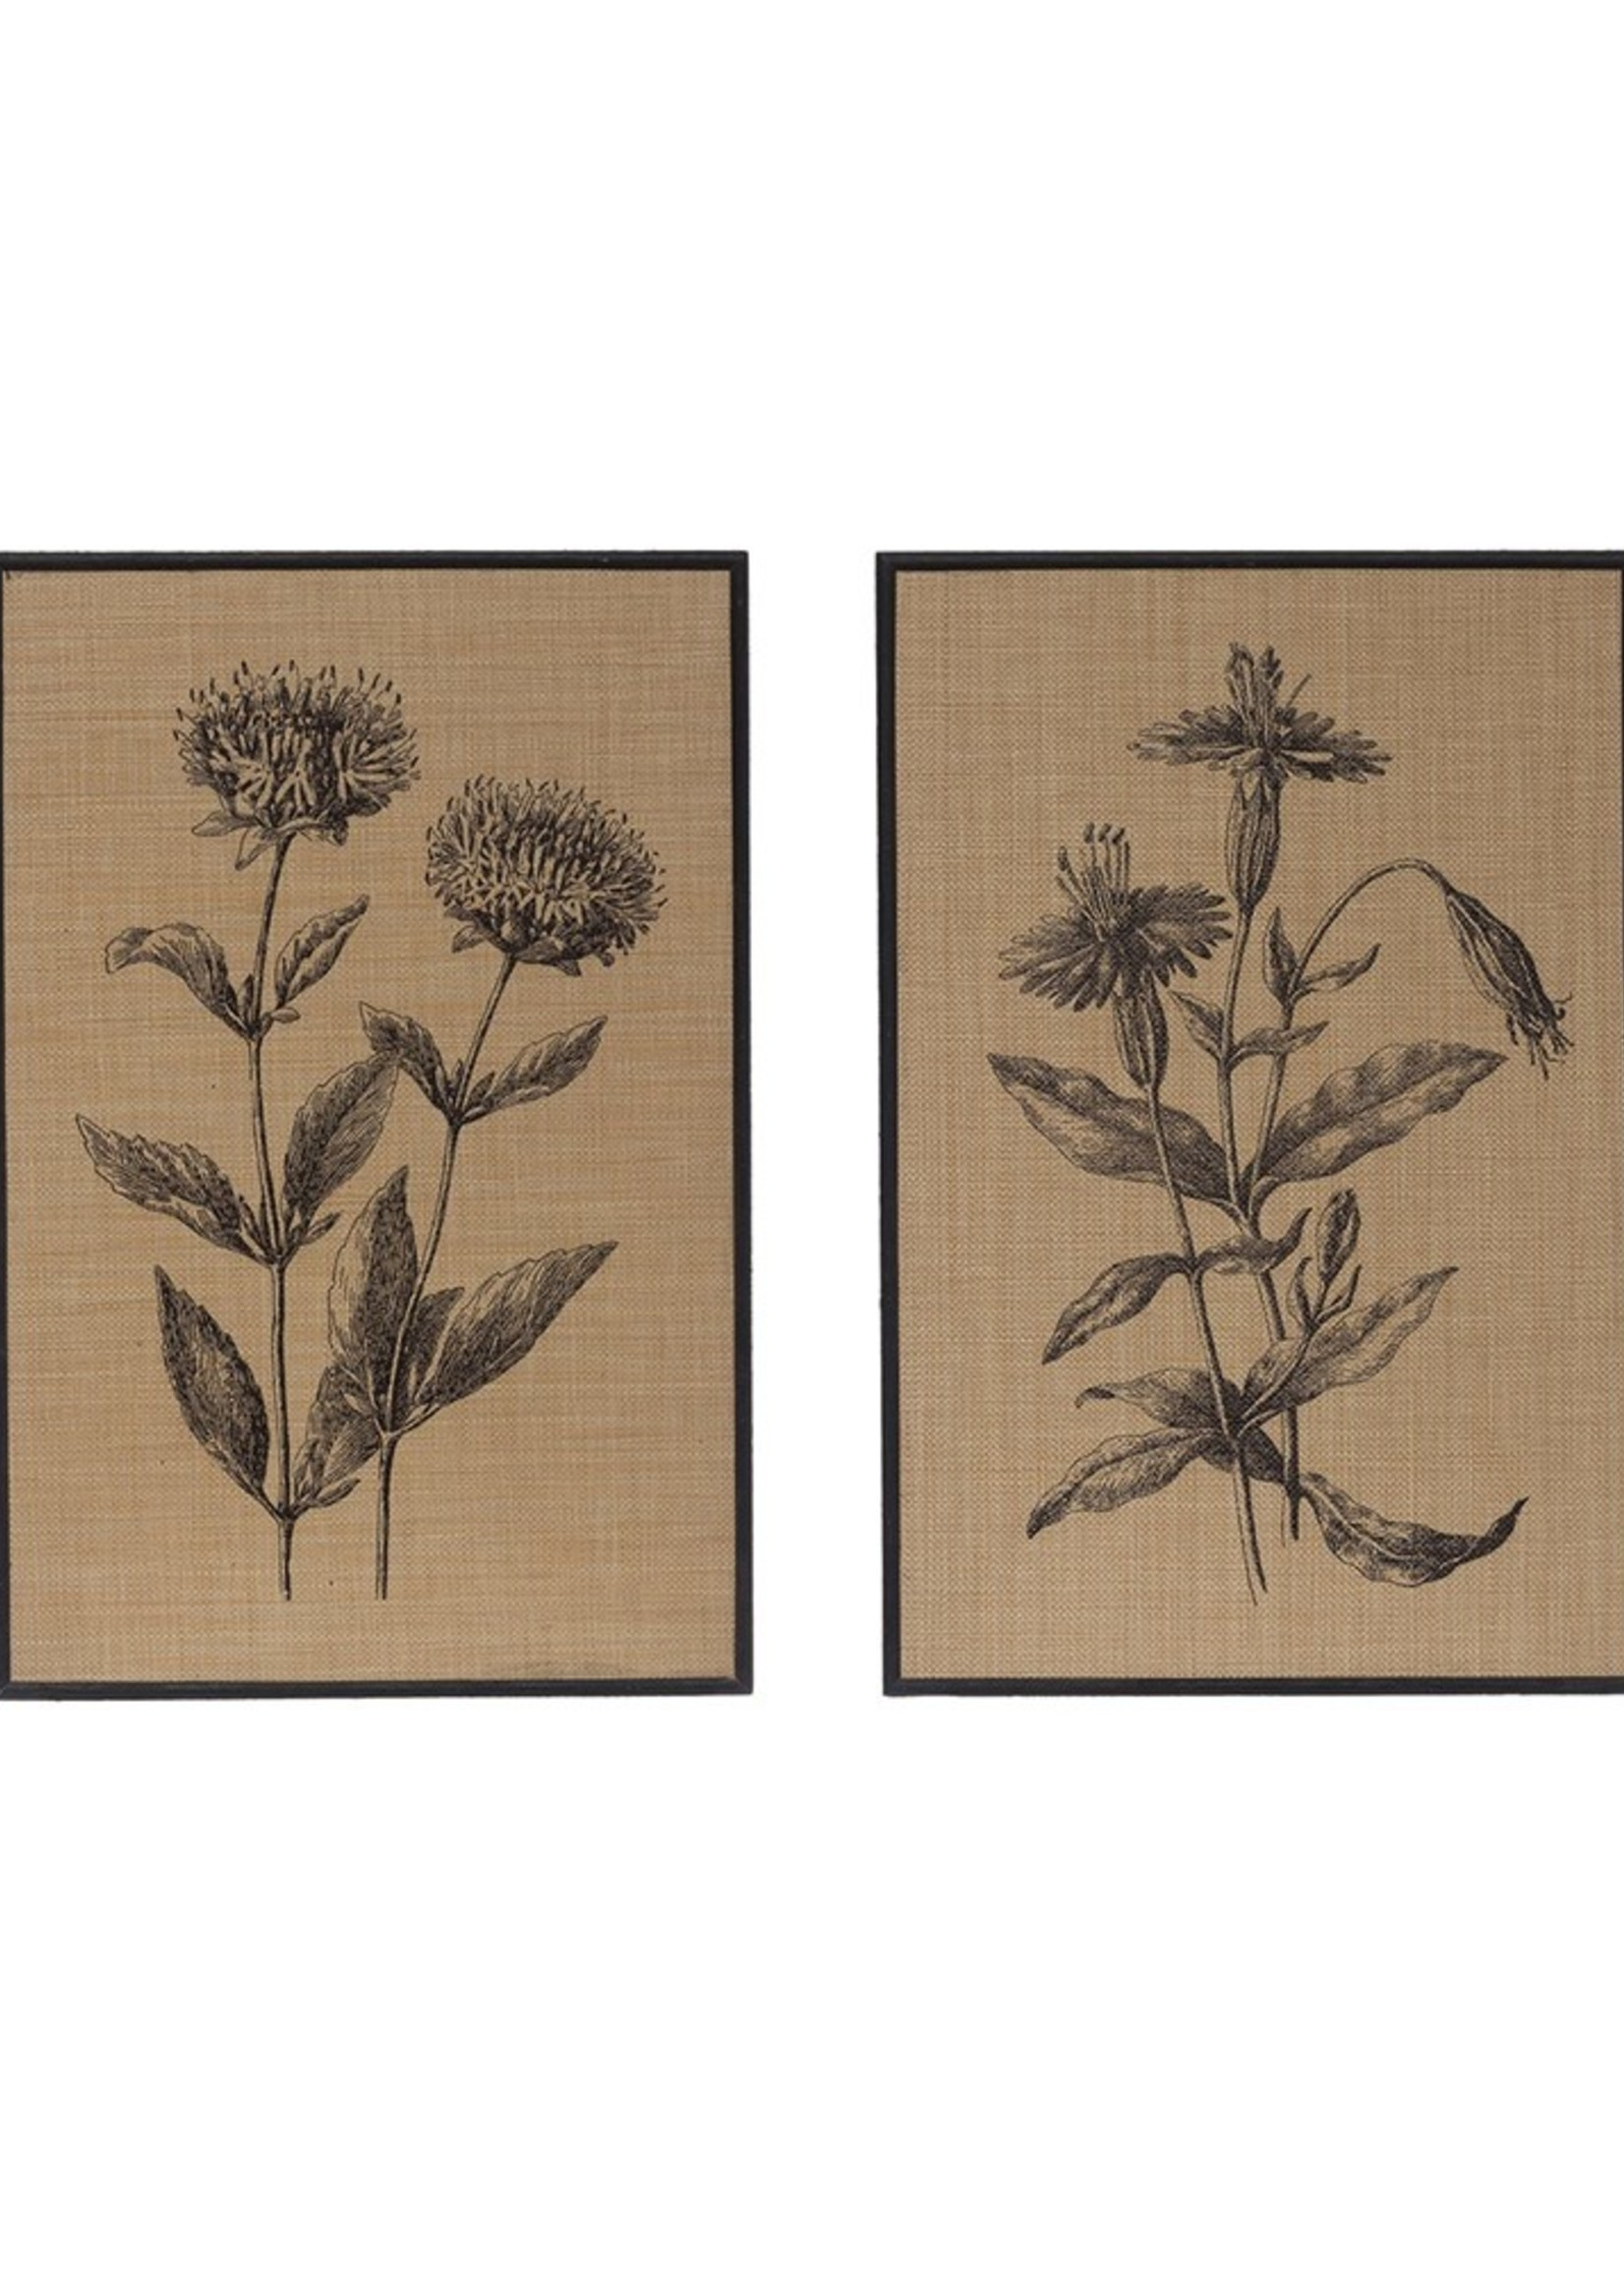 Wood Framed Woven Raffia Wall Decor w/ Flowers, 2 Styles